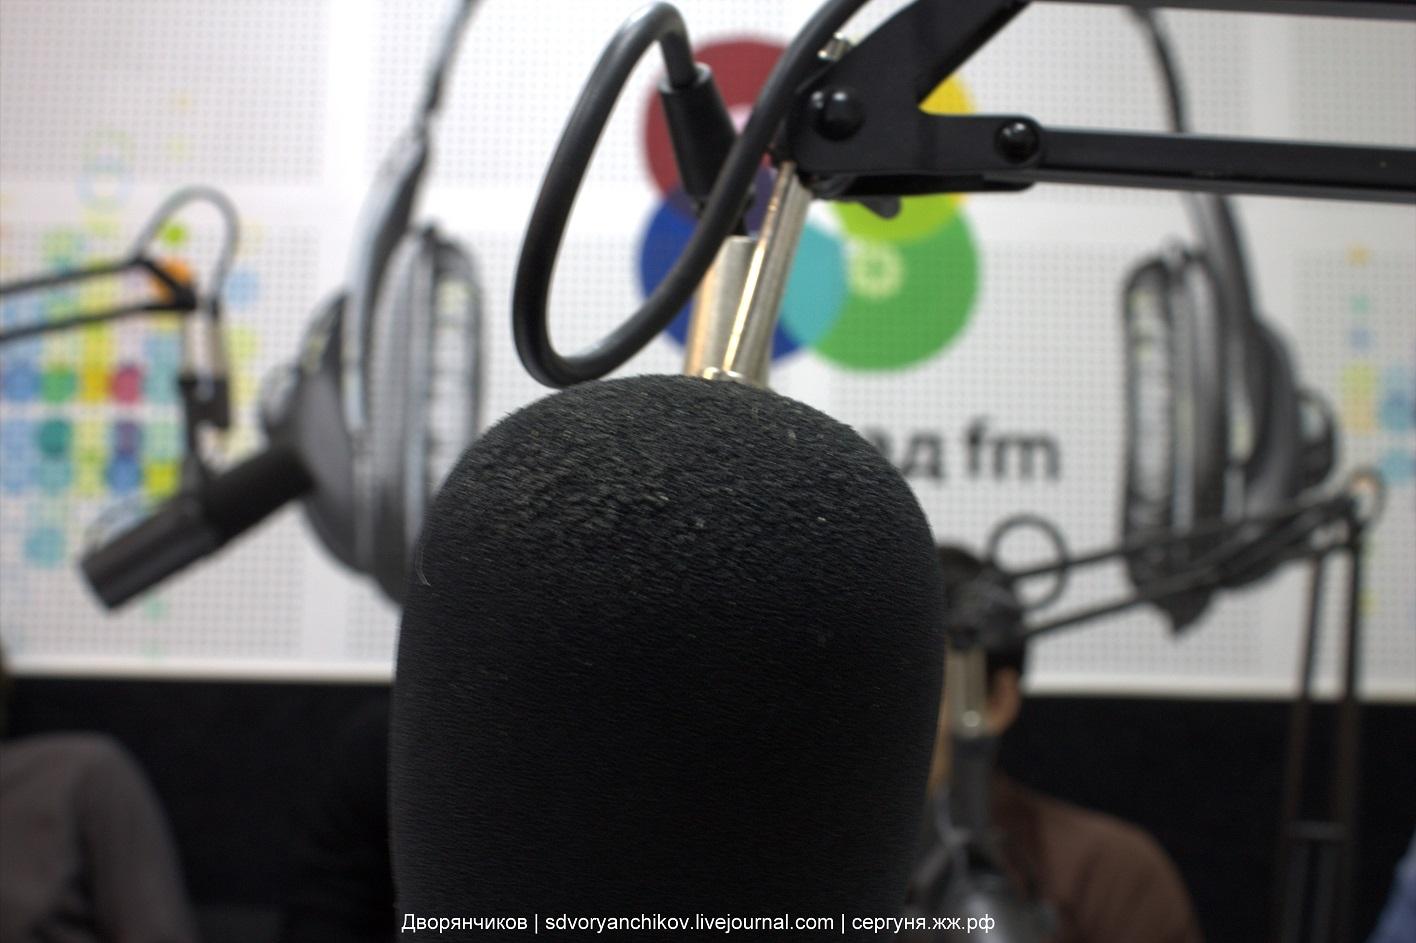 Школа радио - Волгоград - первое занятие